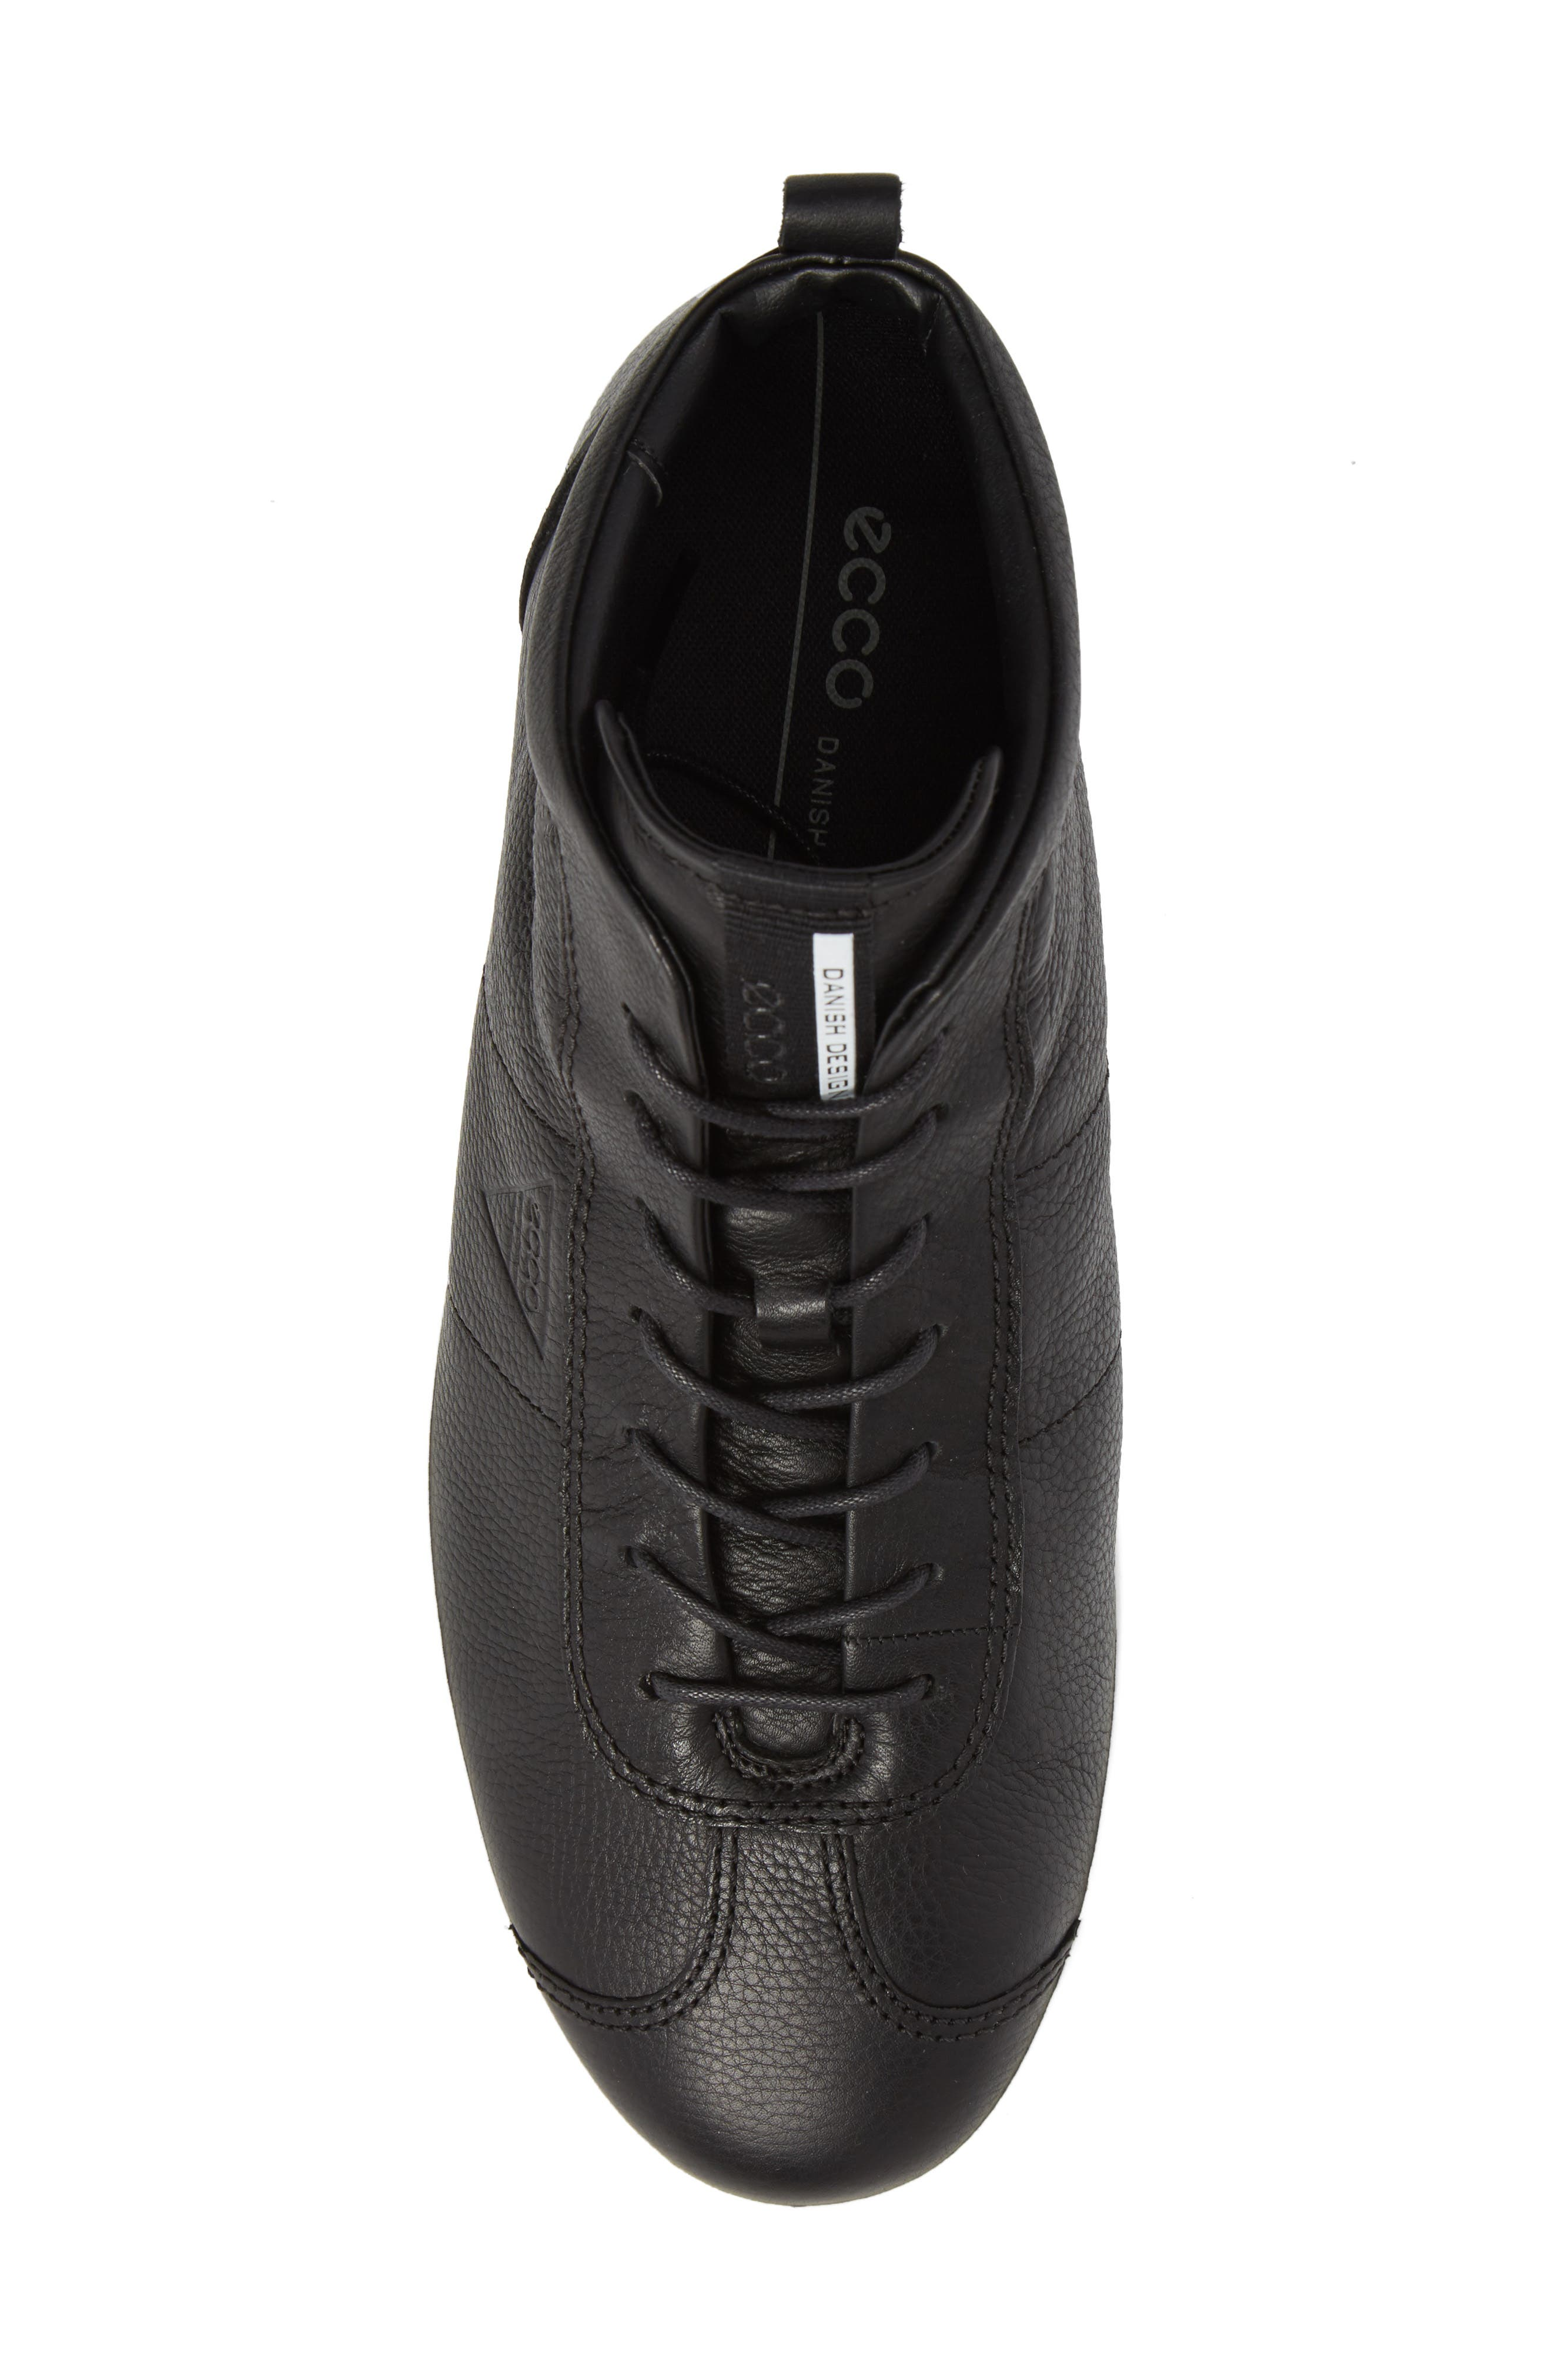 Soft 1 High Top Sneaker,                             Alternate thumbnail 5, color,                             009